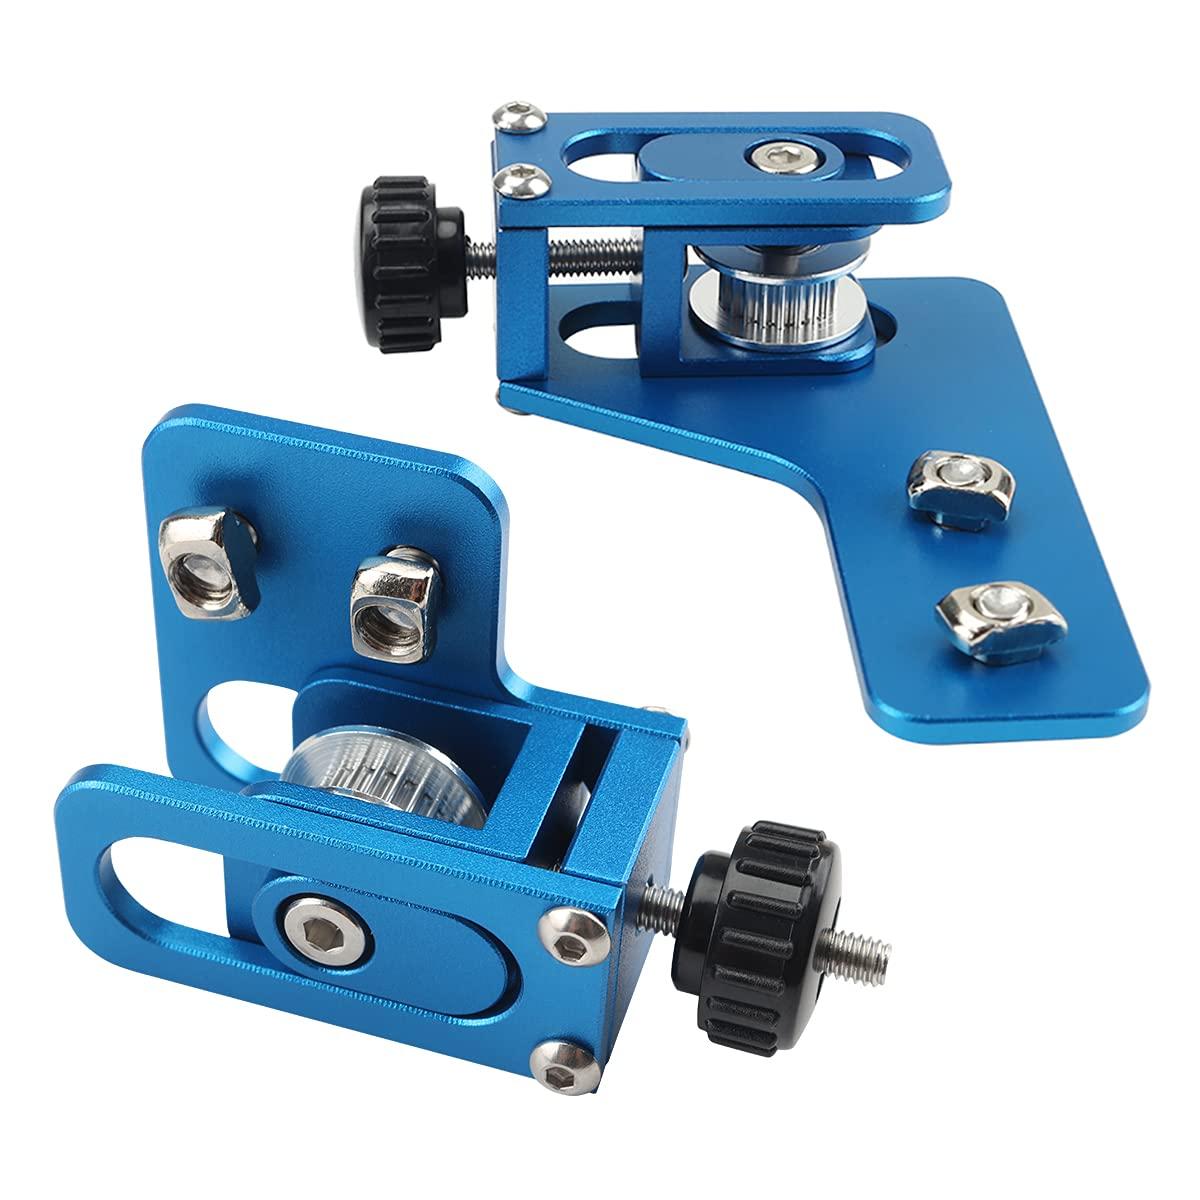 Imdinnogo Upgrade Sidewinder X1 3D Printer Accessories Adjustable X-axis Y-axis Synchronous Belt Stretch Straighten Tensioner Kit Compatible with Artilery Sidewinder X1 Parts